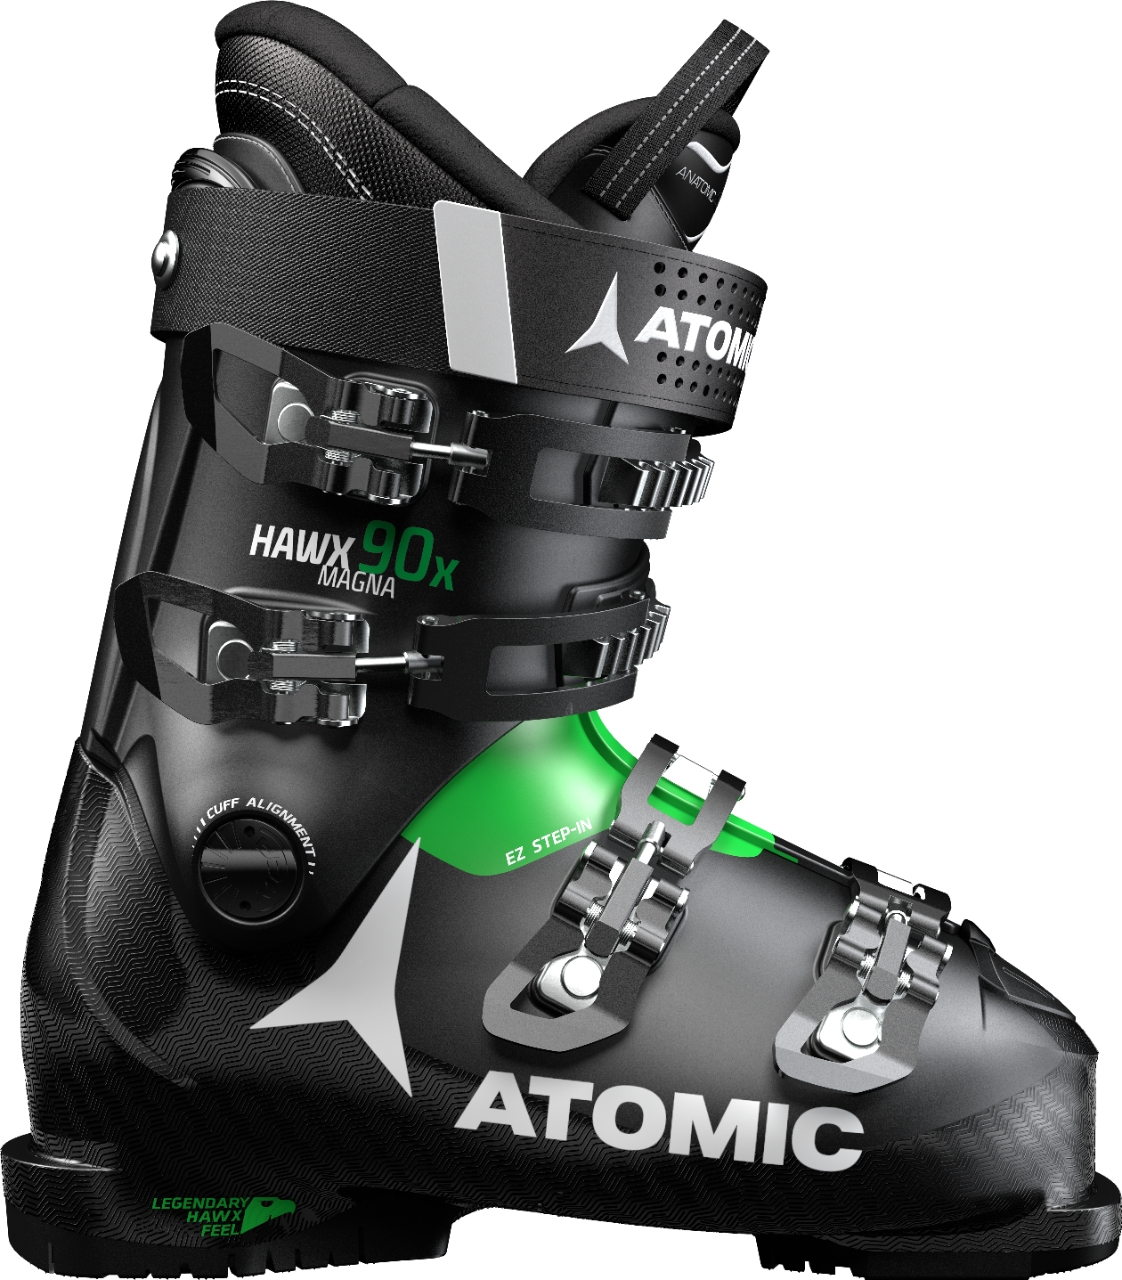 Atomic HAWX MAGNA 90X, muške pancerice, crna